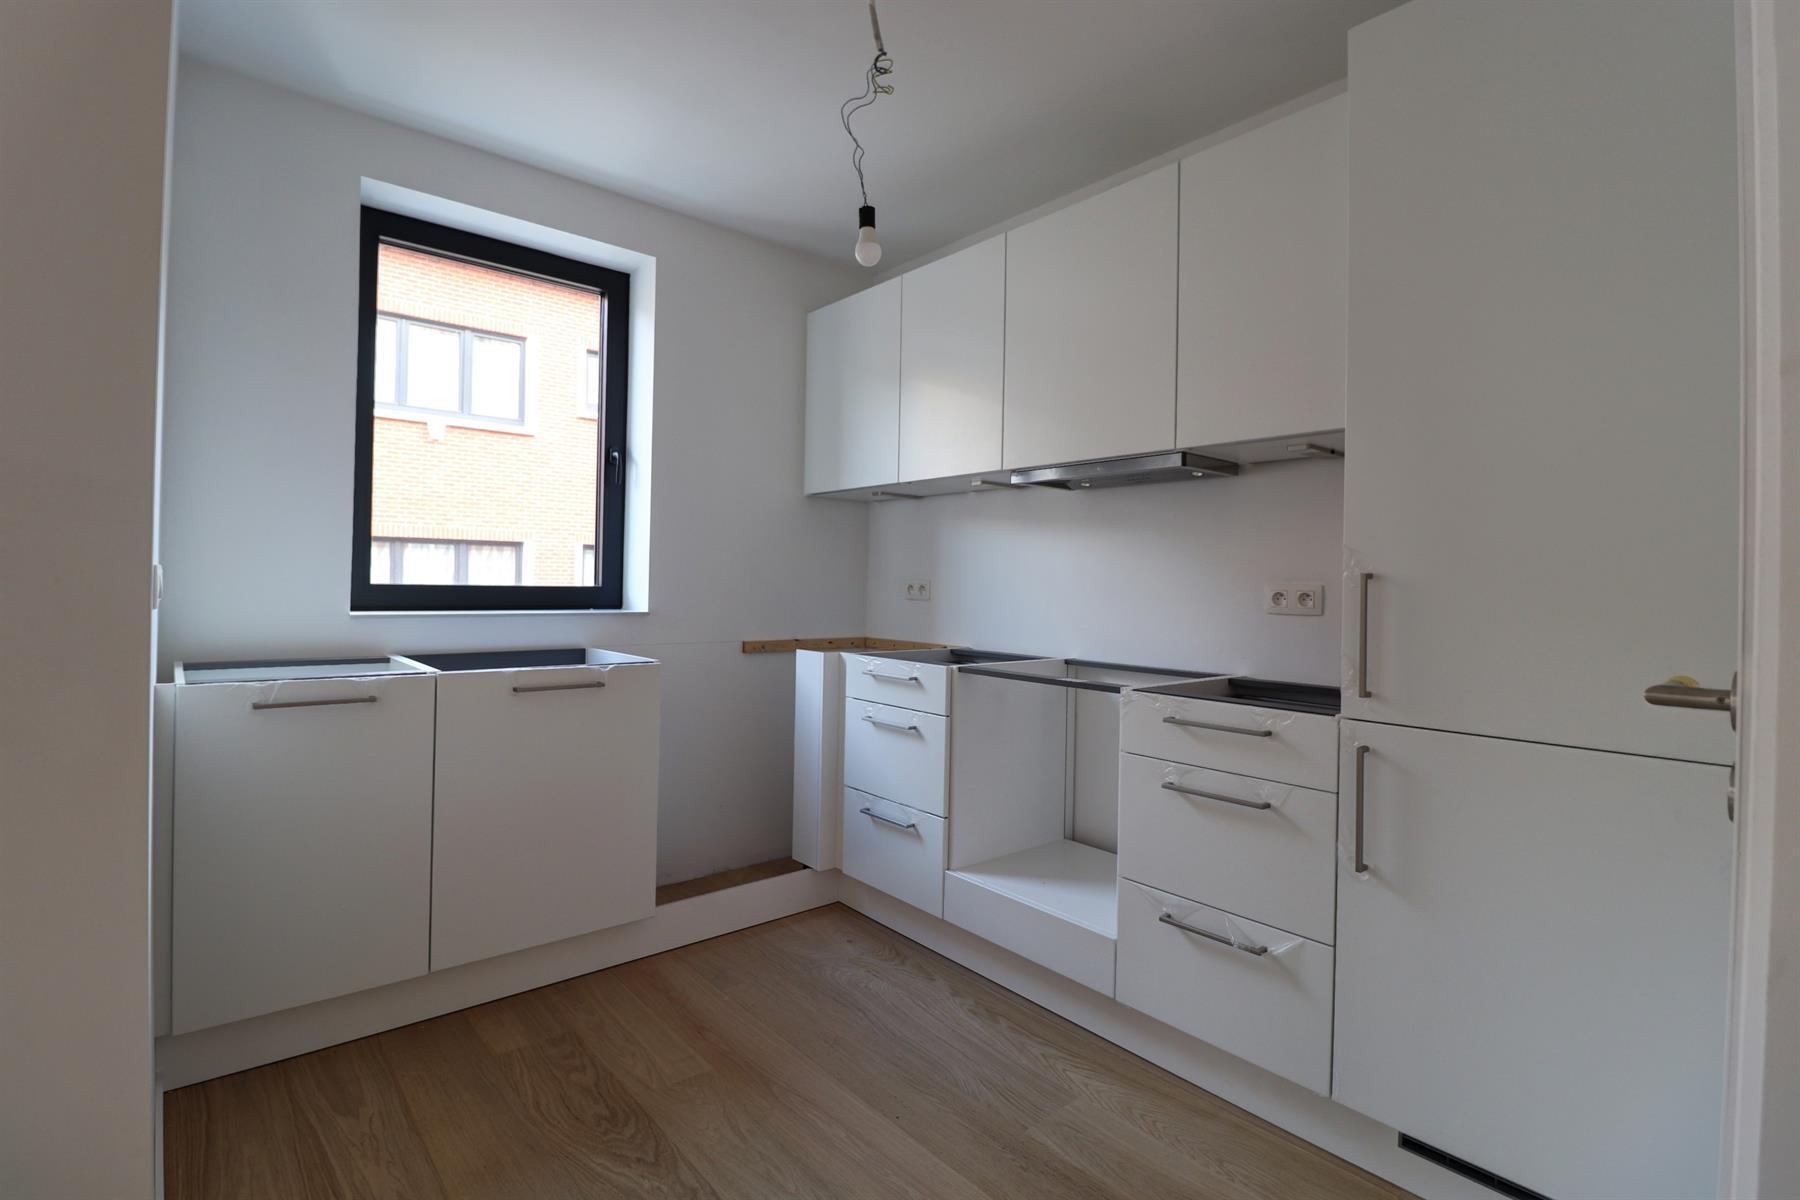 Duplex - Auderghem - #4185468-2